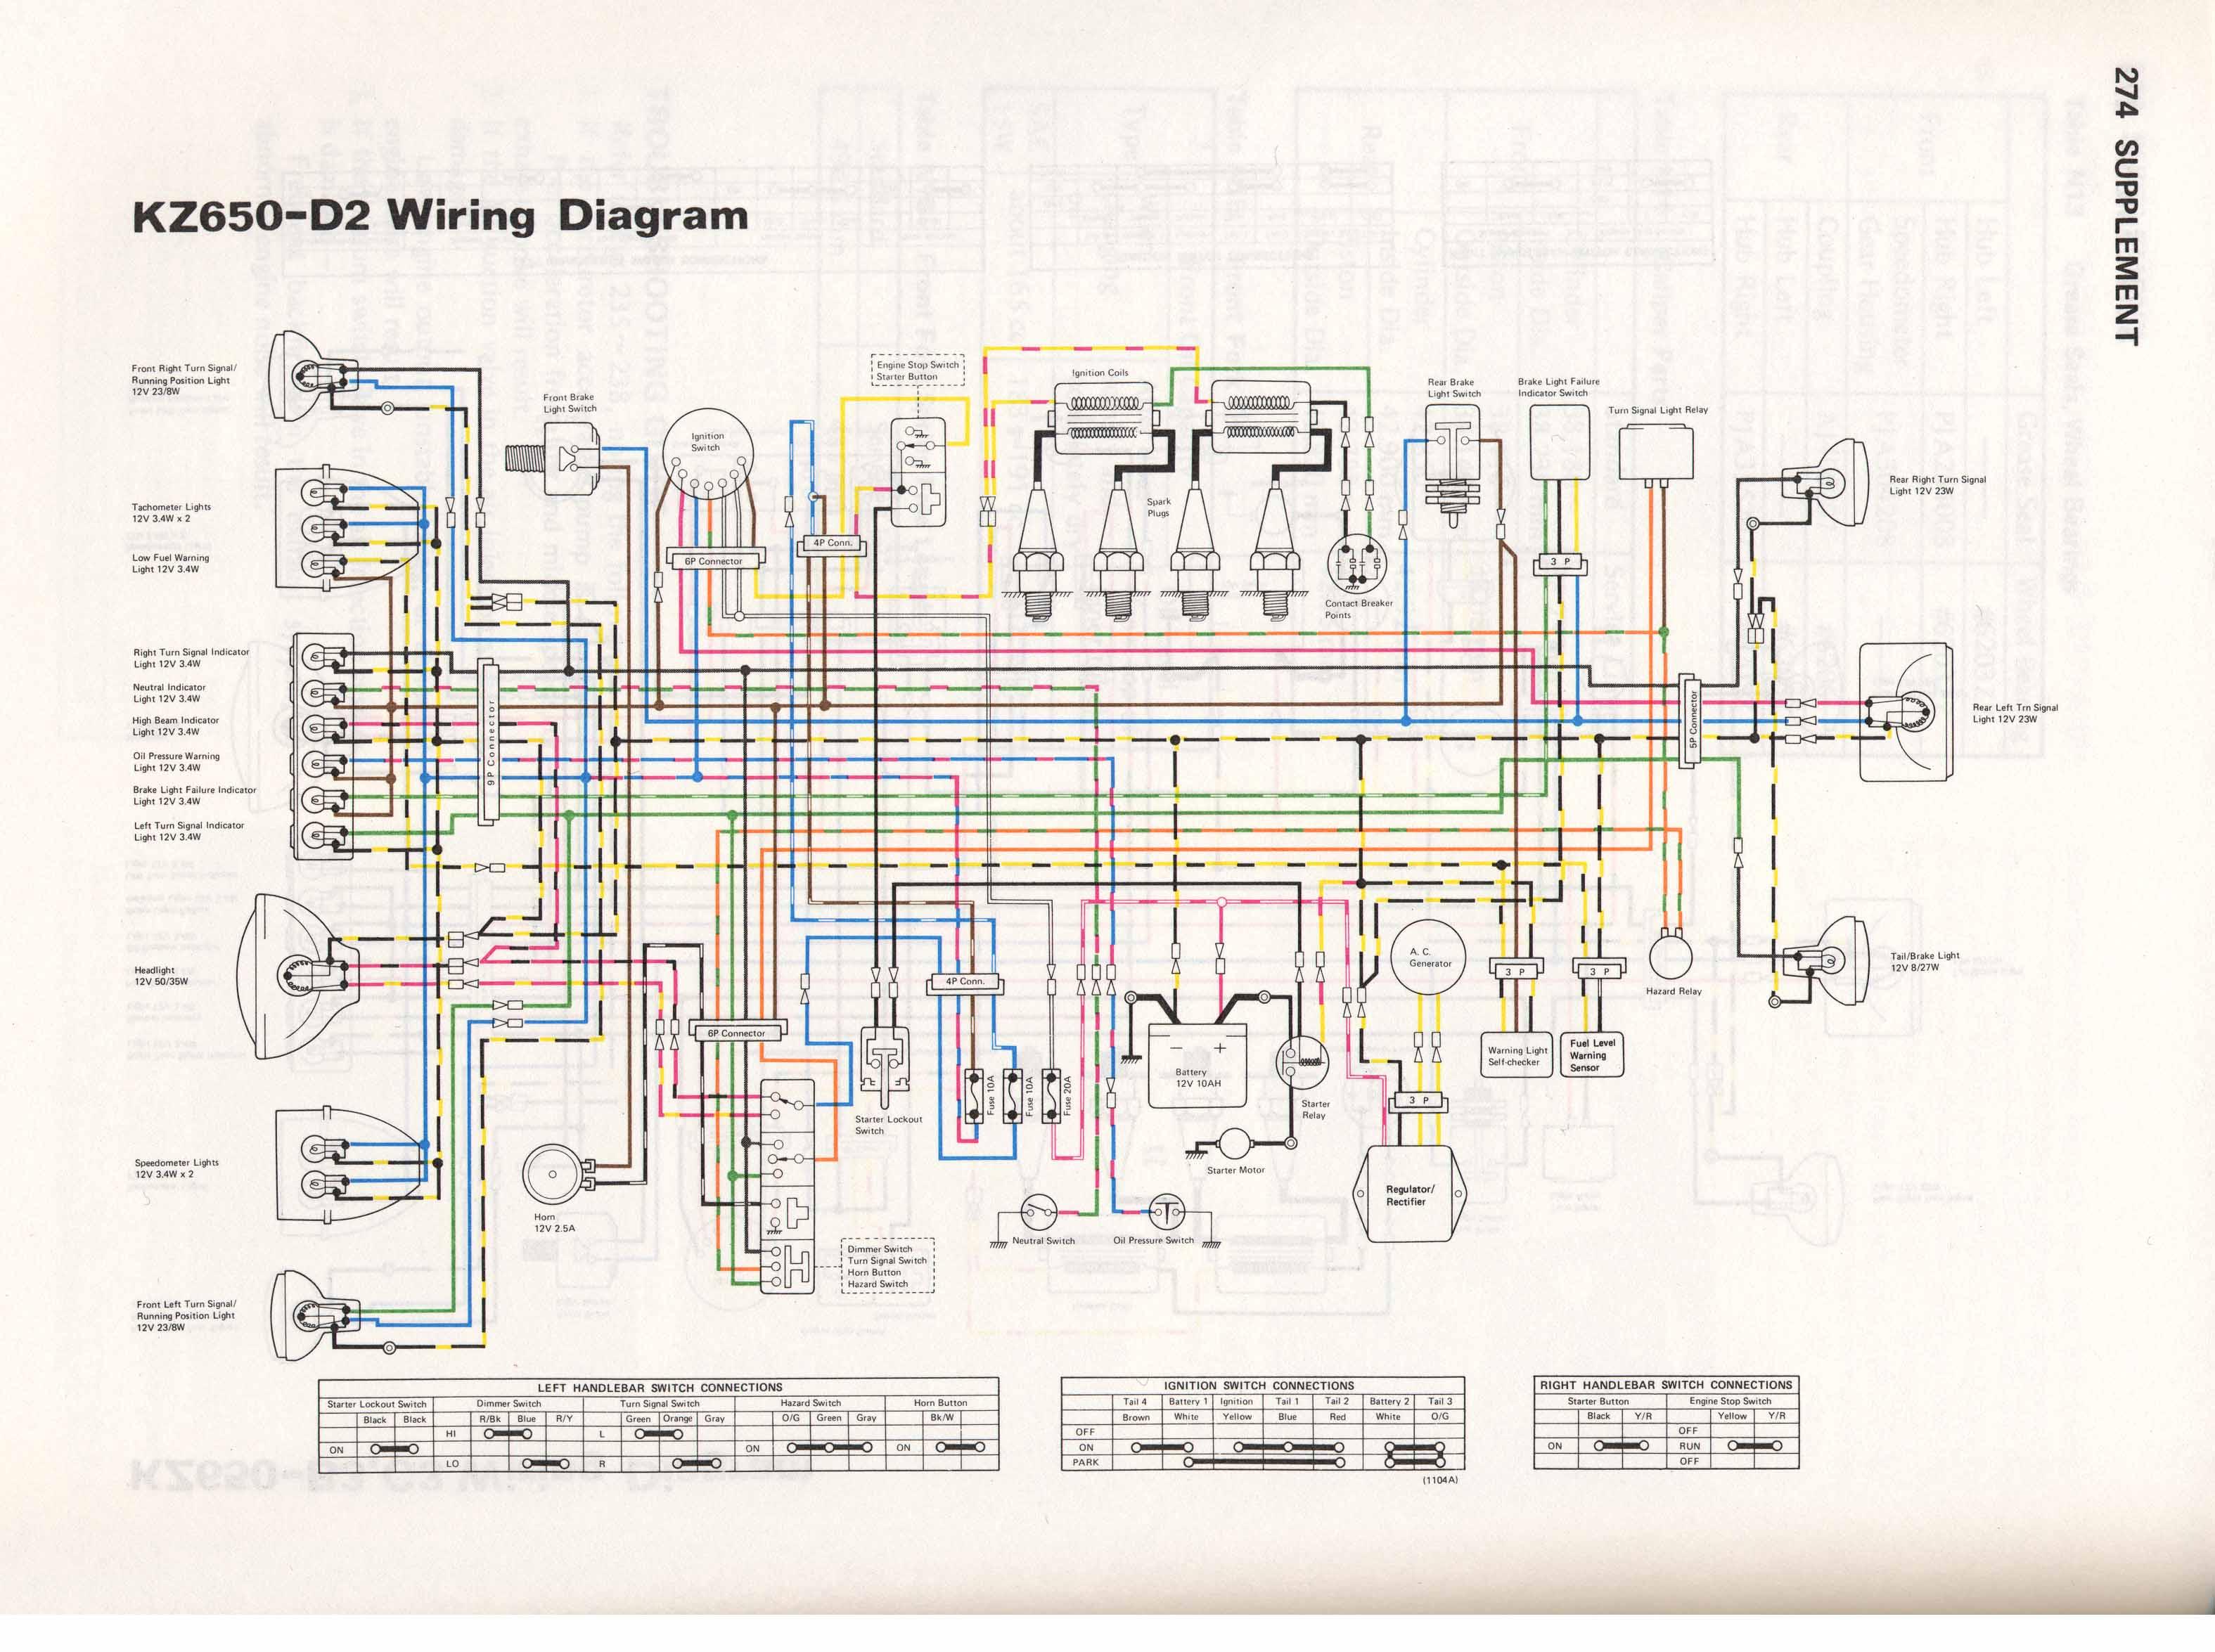 Kz650 D2 Bare Bones Wiring Diagram Help Do The Ton